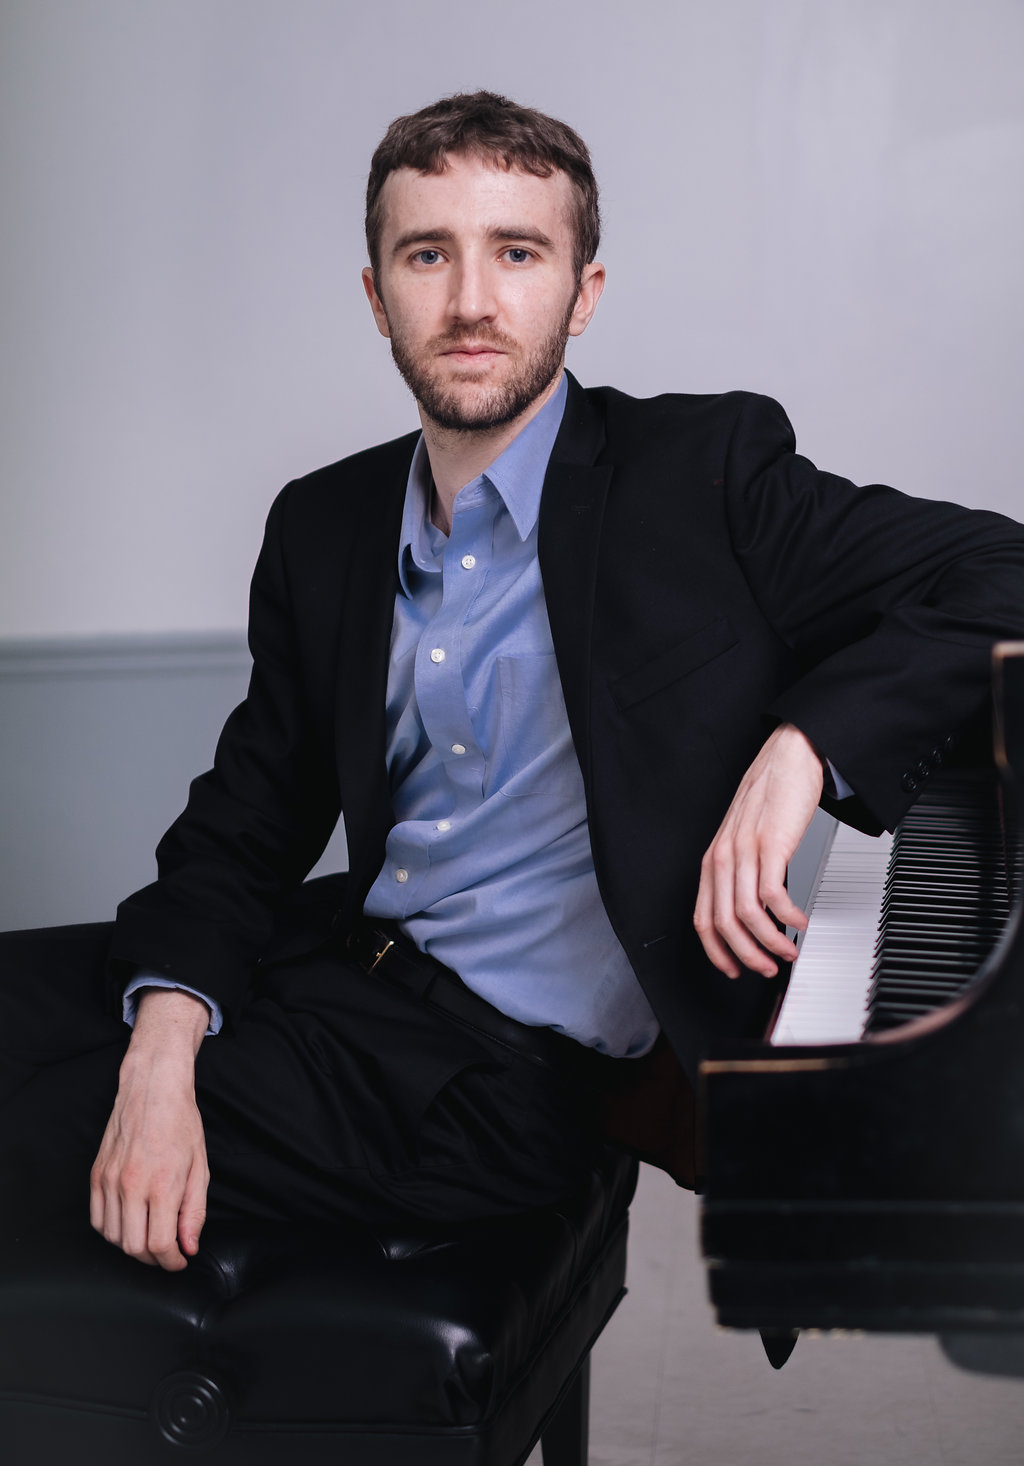 Sam Post, piano, composer